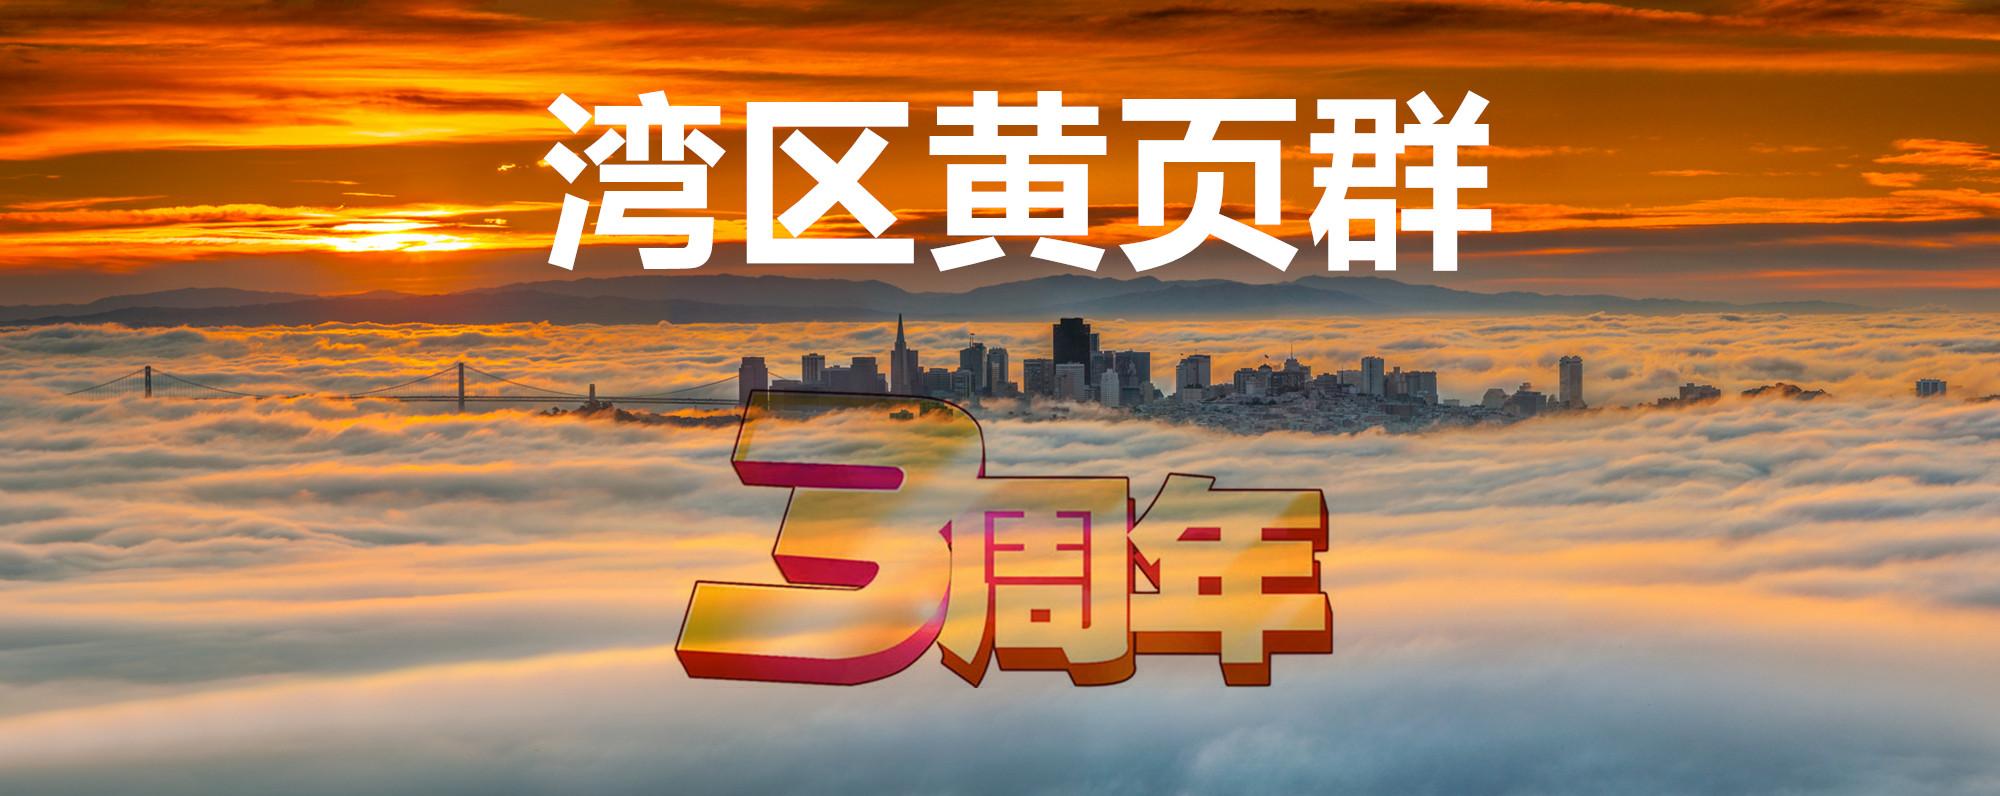 湾区黄页群三周年庆典